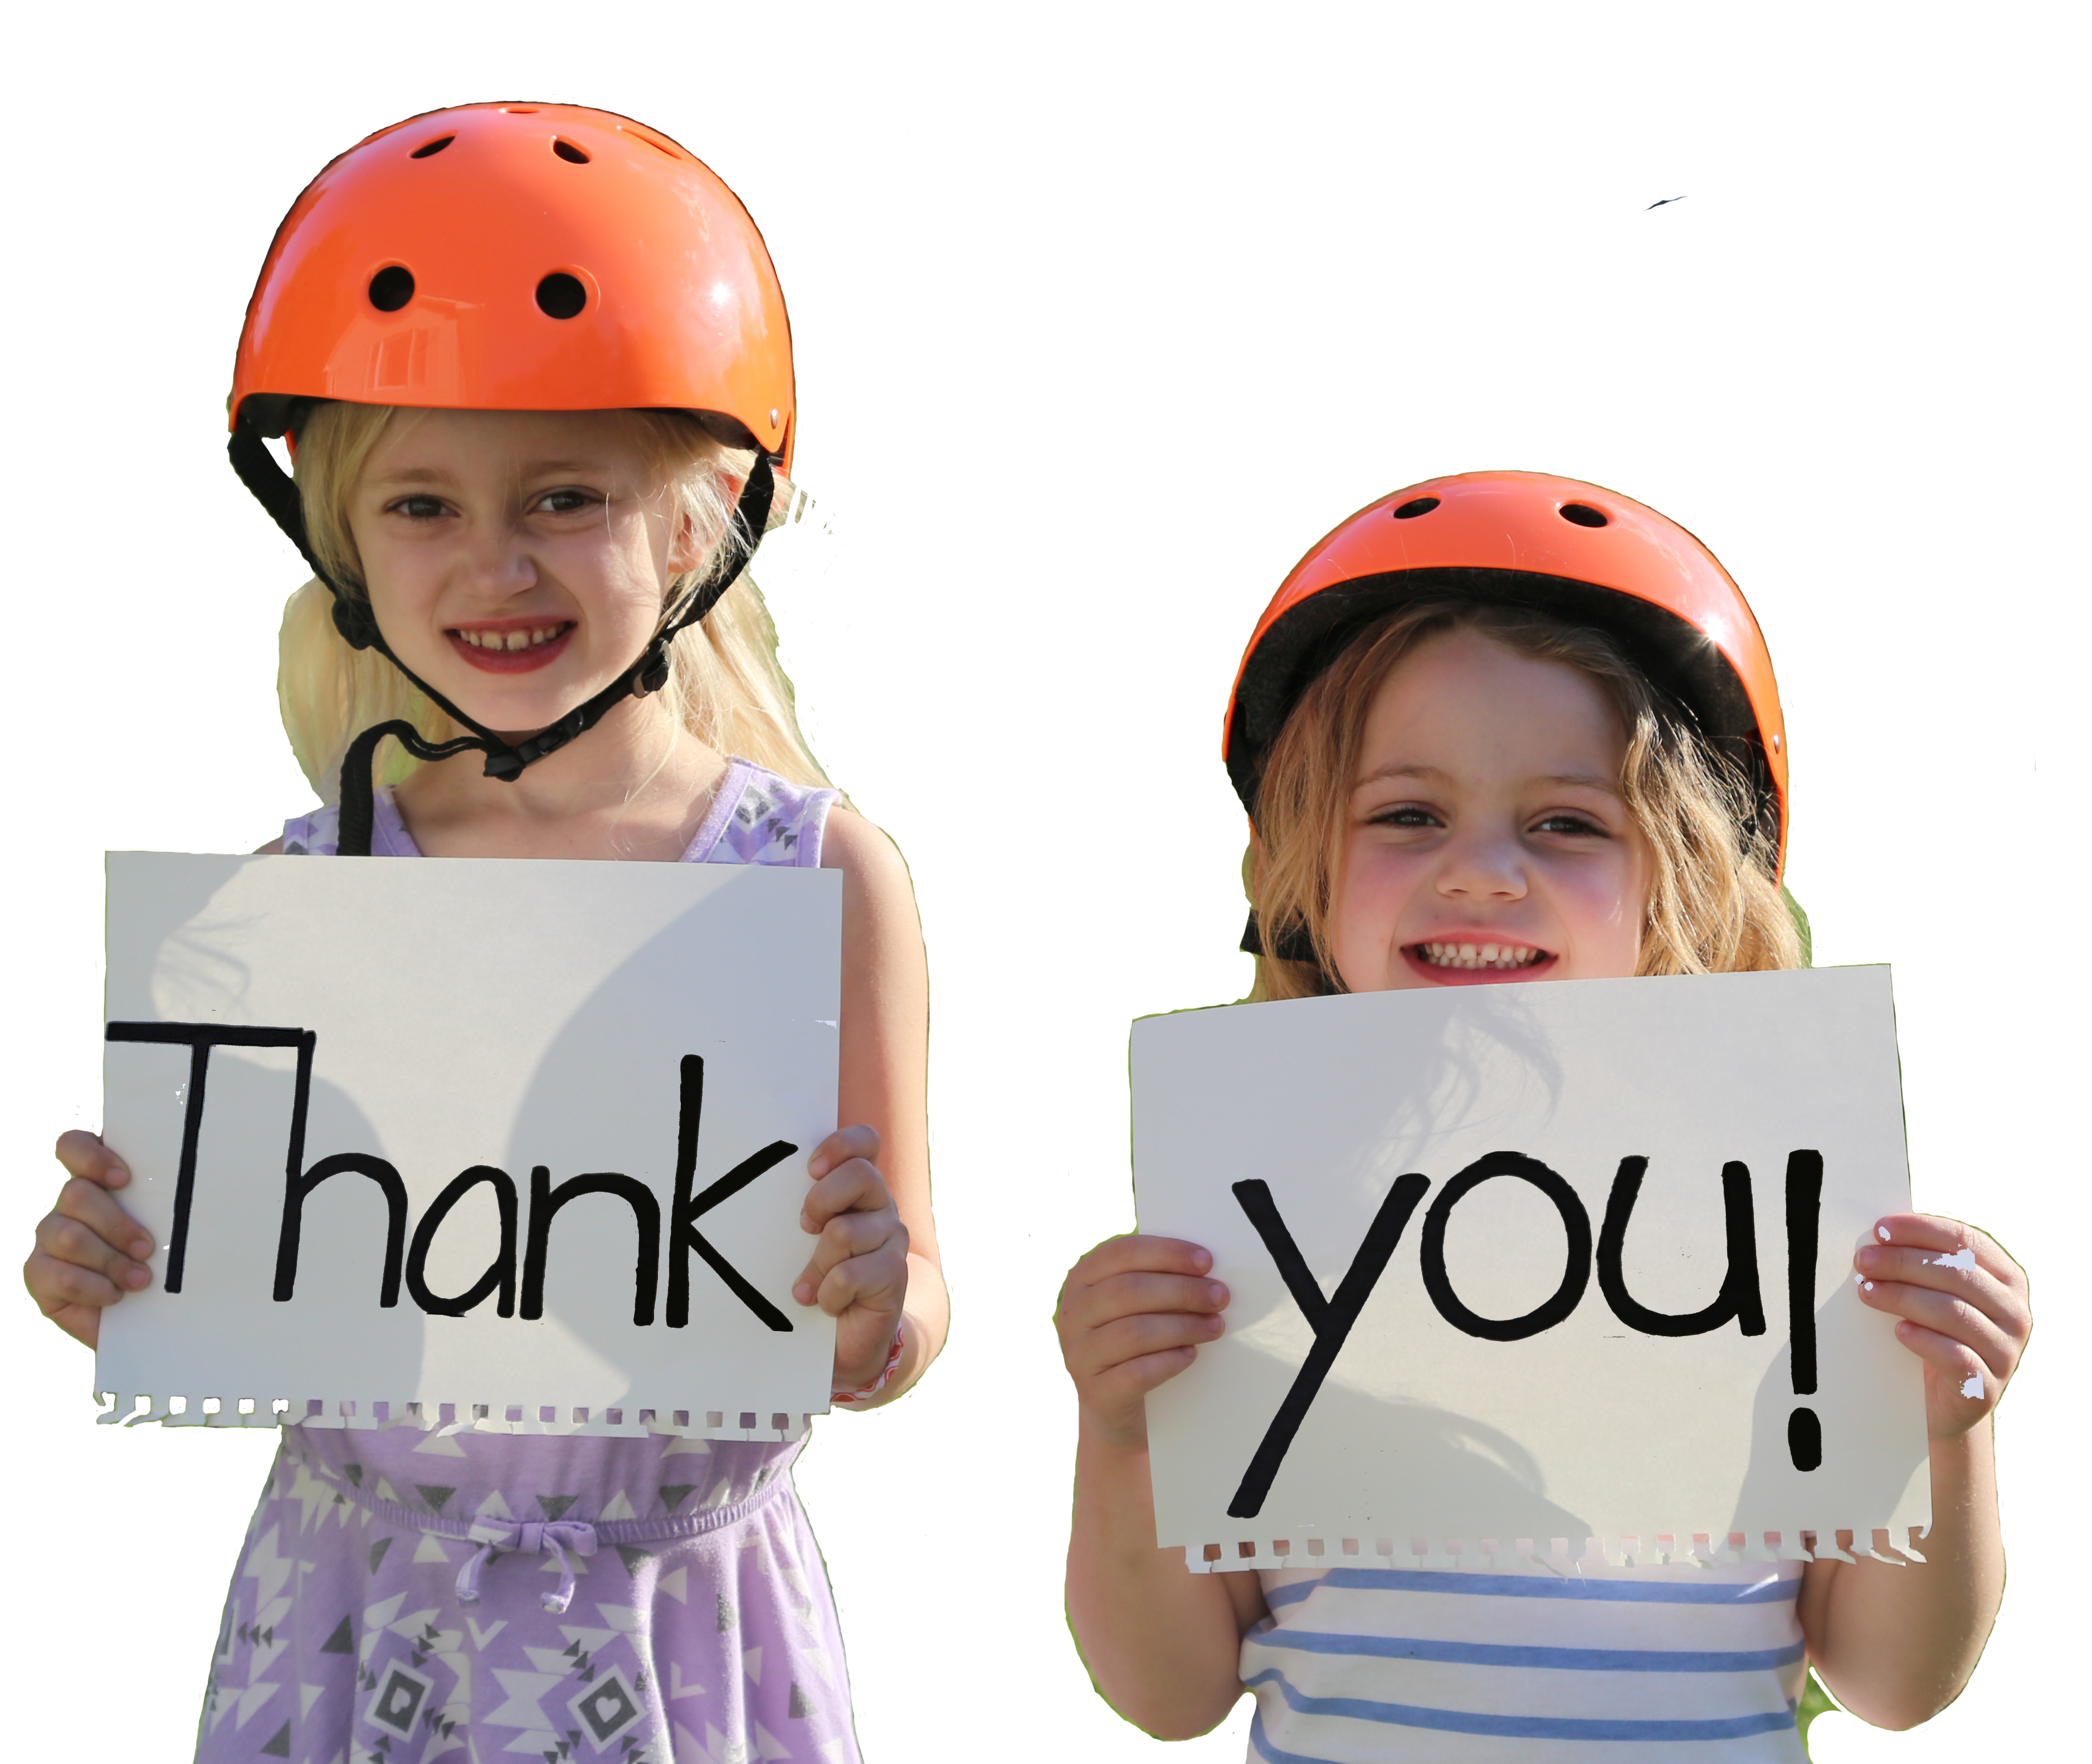 sheeran_thank_you.jpg